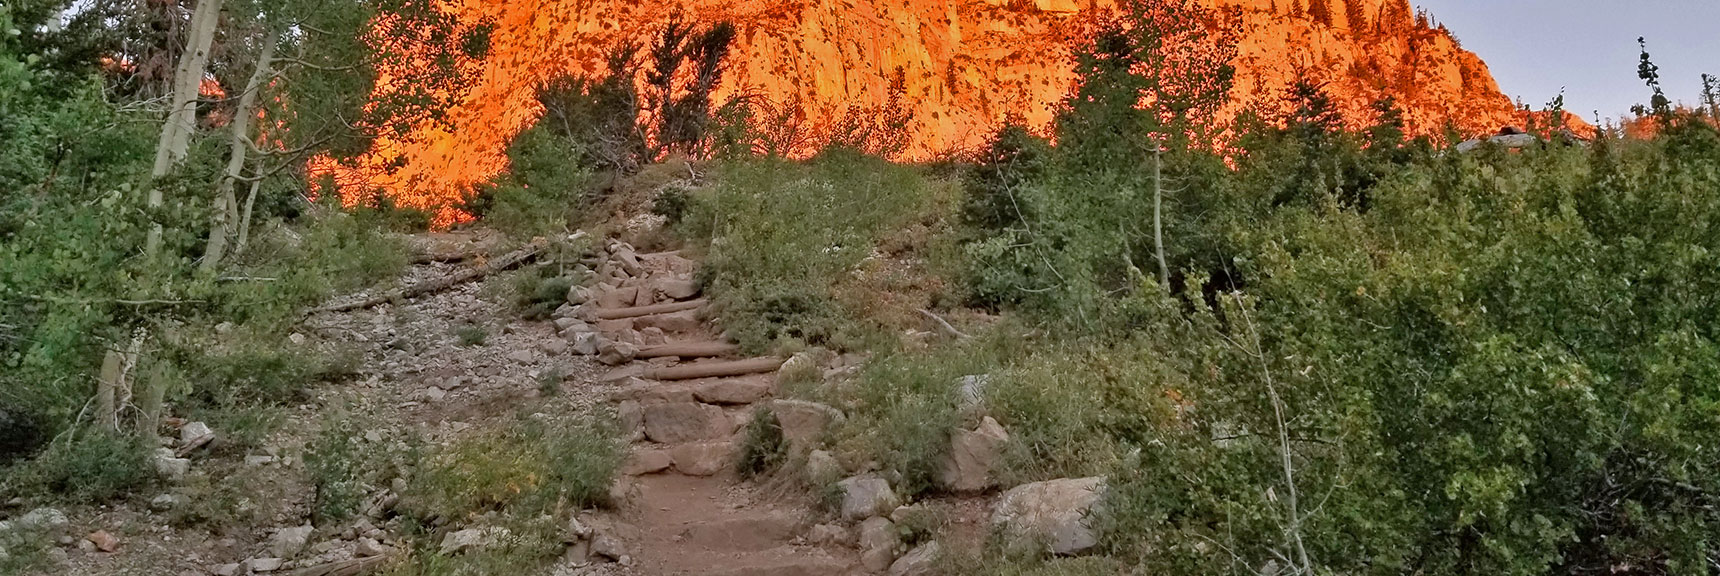 Endless Stairway on South Climb Trail | Griffith Peak & Charleston Peak Circuit Run, Spring Mountains, Nevada